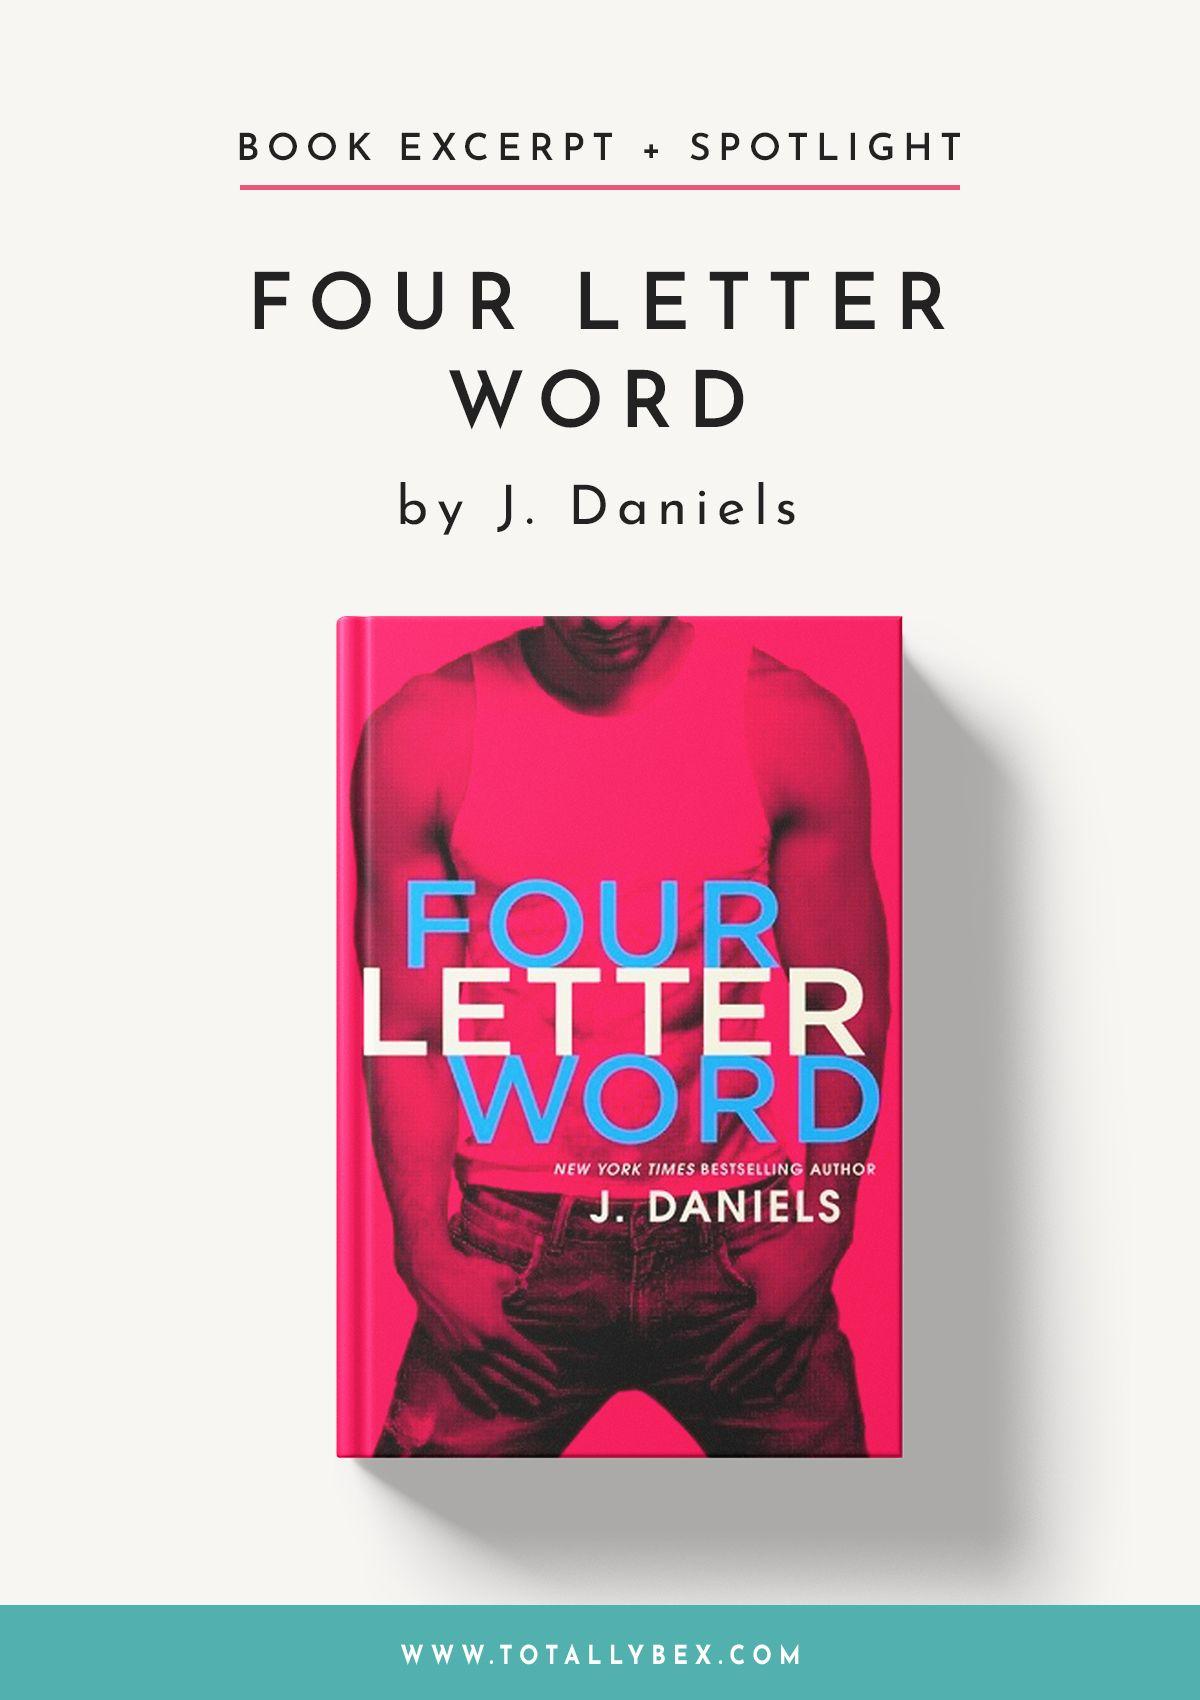 Four Letter Word Excerpt Author J Daniels Favorite Four Letter Words In 2020 Four Letter Words Letter N Words Contemporary Romance Books